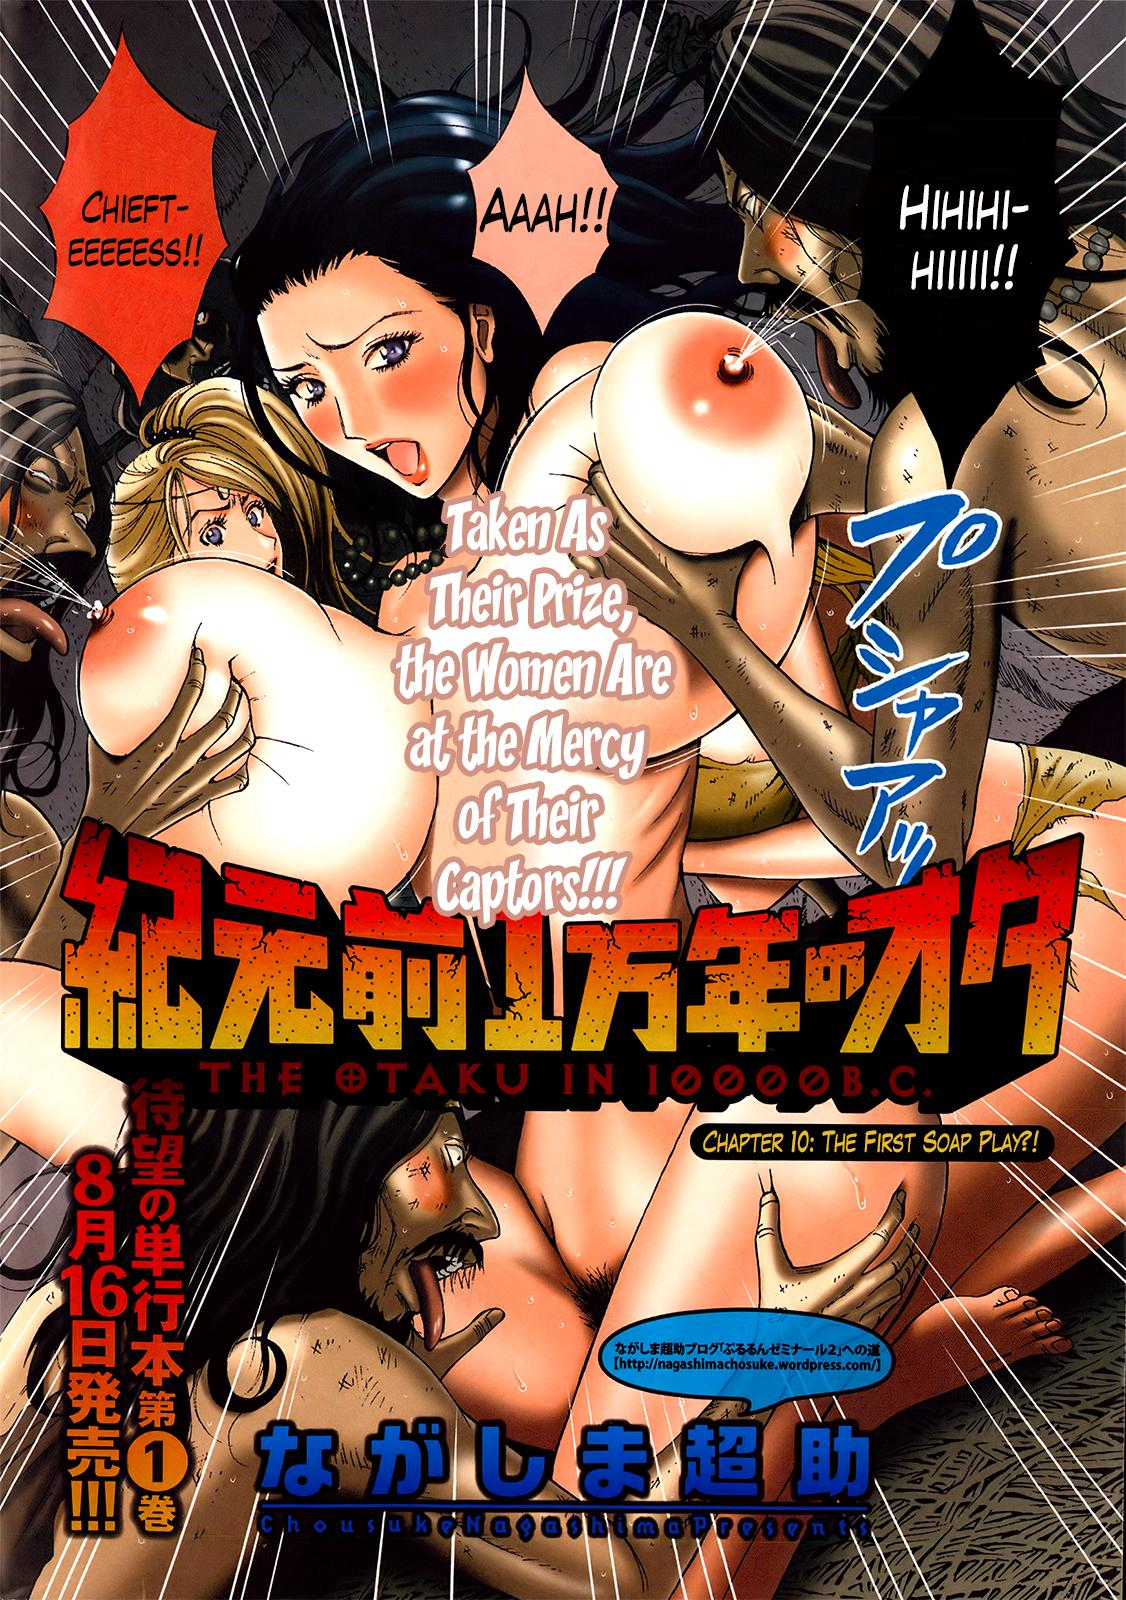 Kigenzen 10000 Nen no Ota | The Otaku in 10,000 B.C. 176